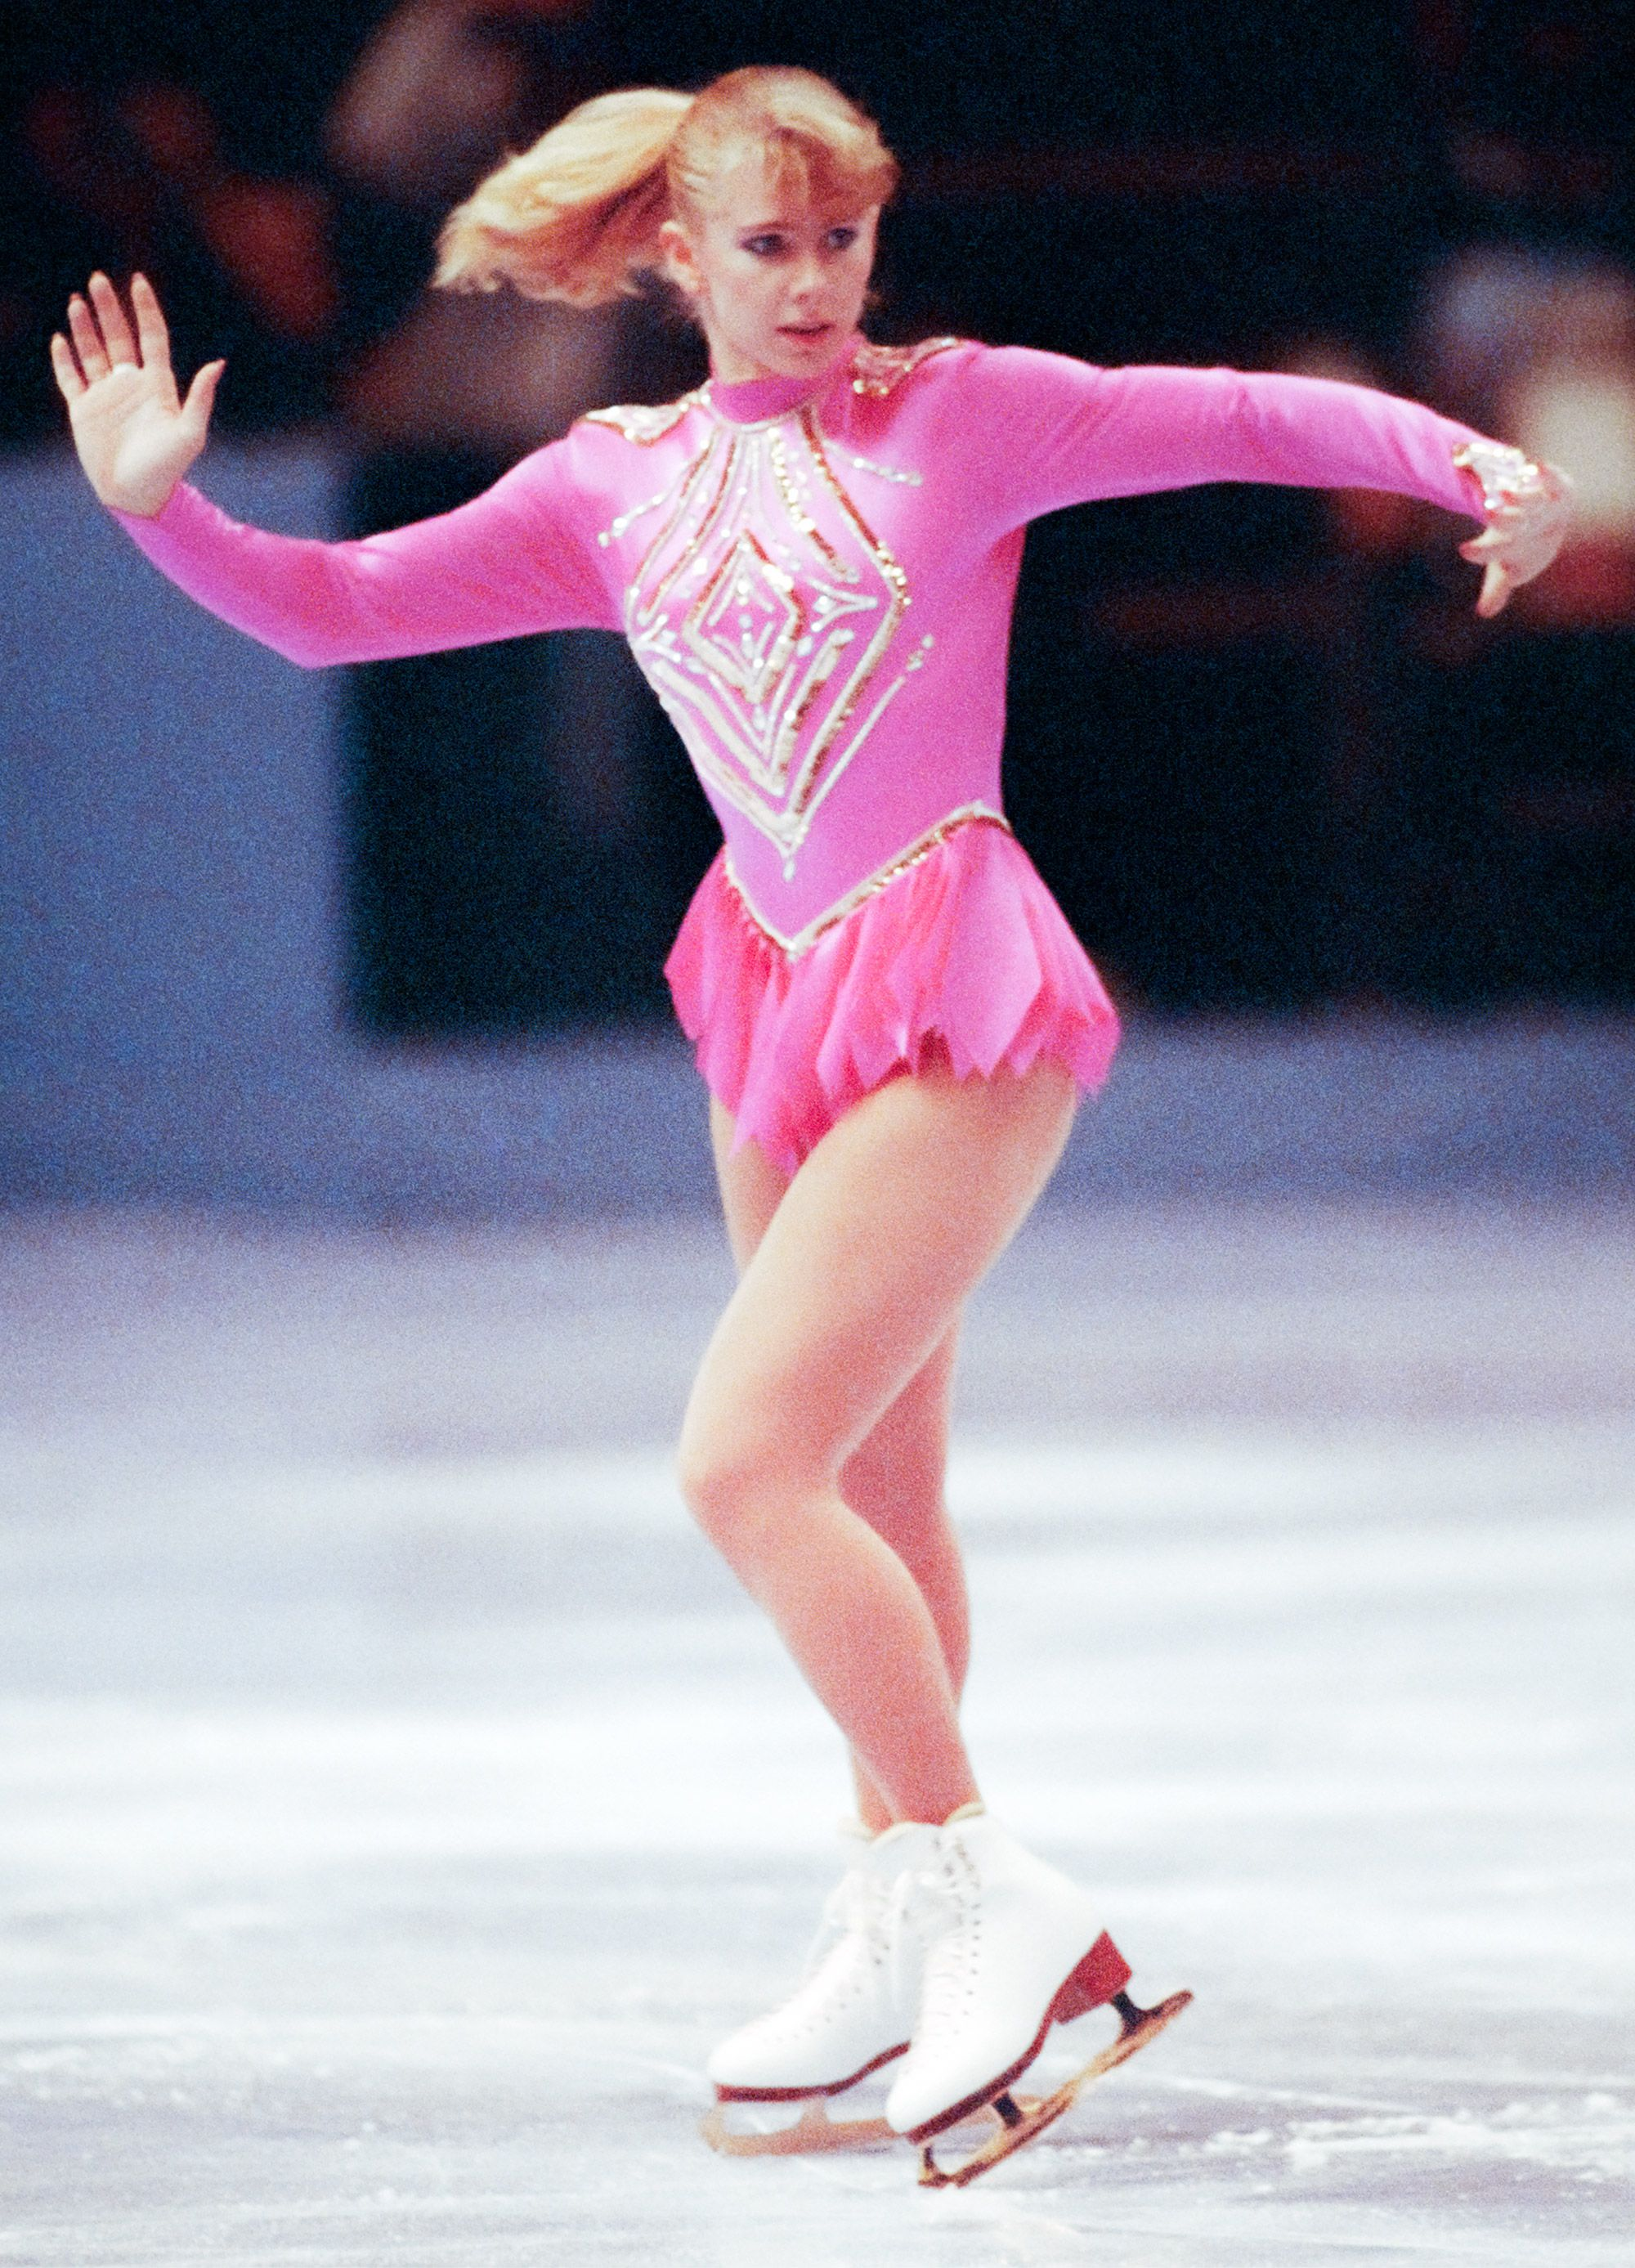 Vintage Photos 1994 Press Photo Tonya Harding American Figure Skater Performing at Olympics